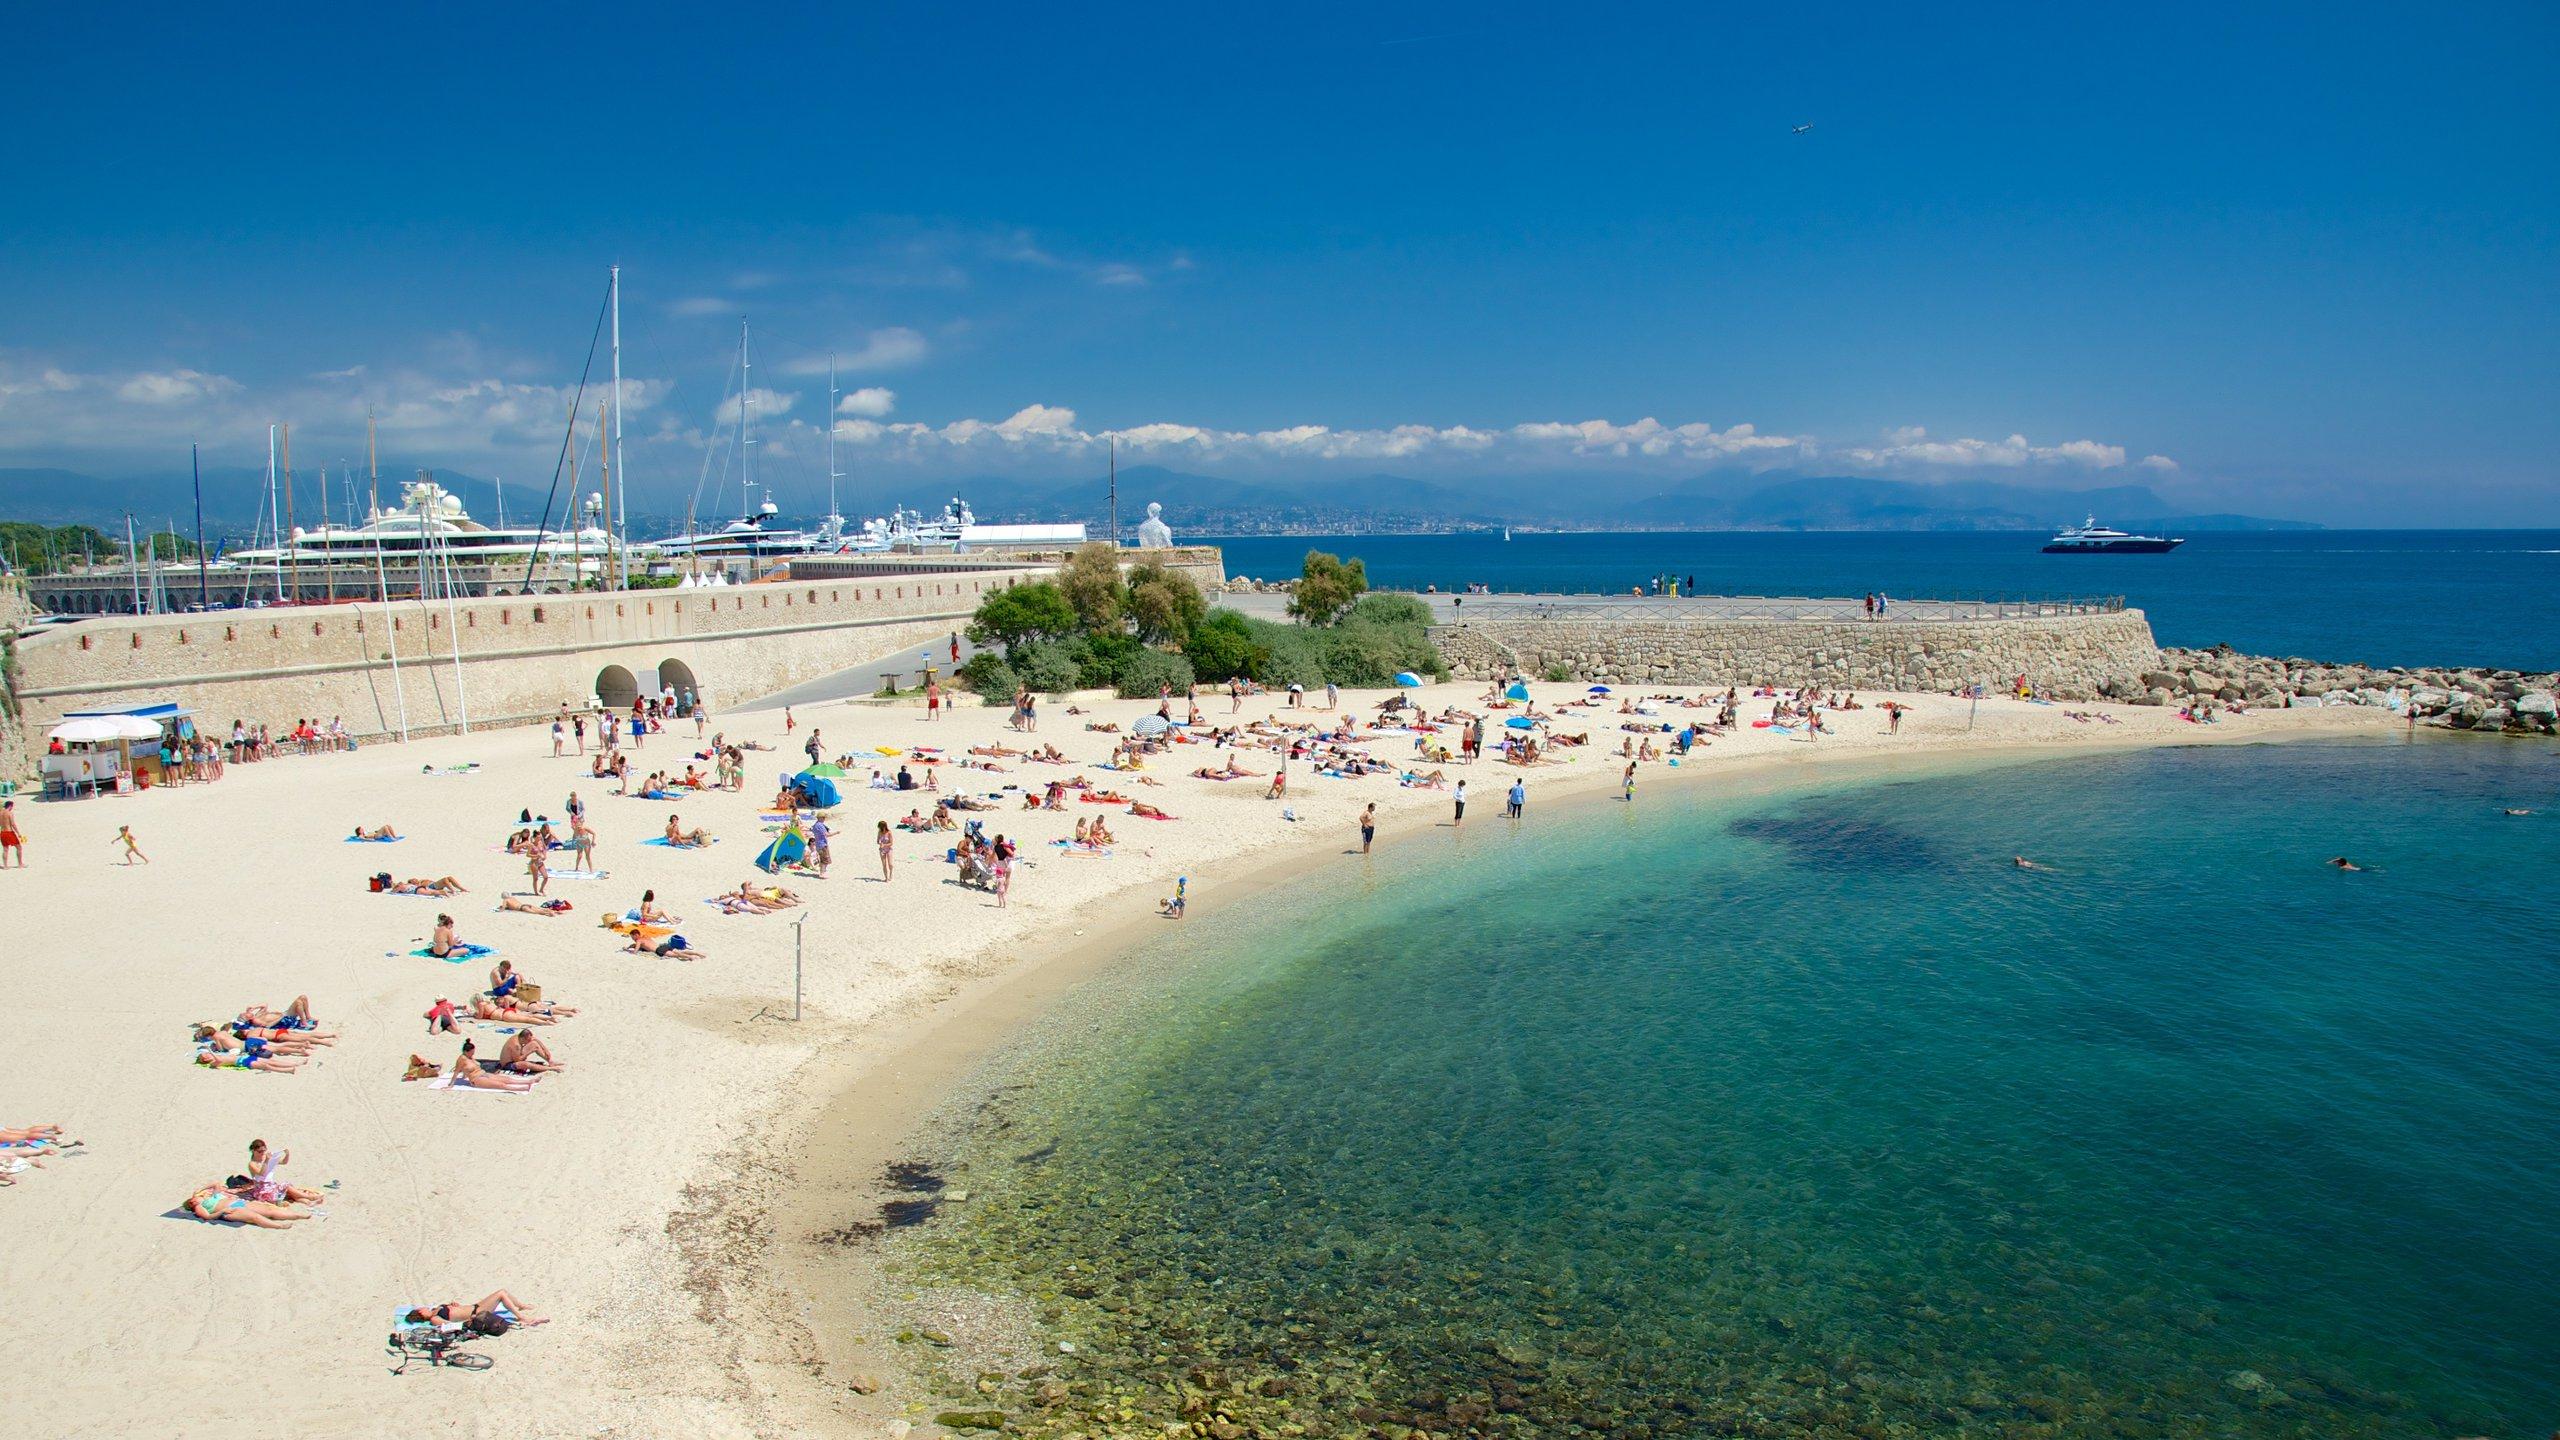 Antibes, Alpes-Maritimes, France